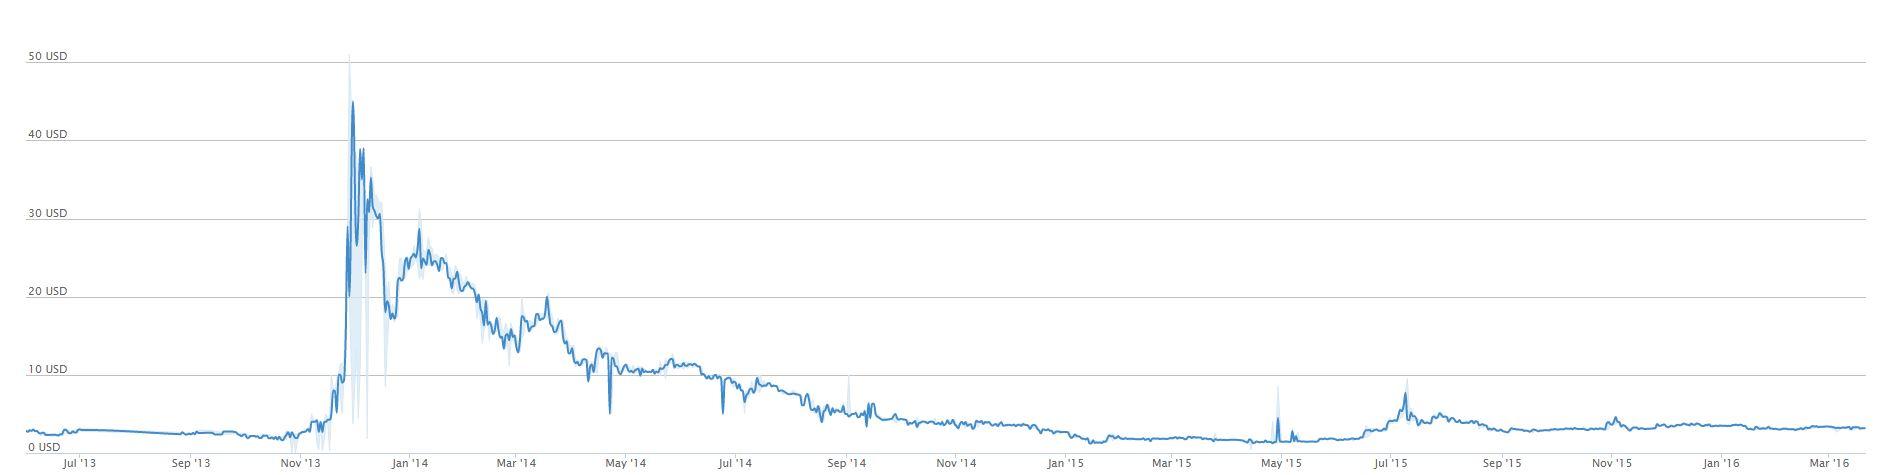 Litecoin Value USD